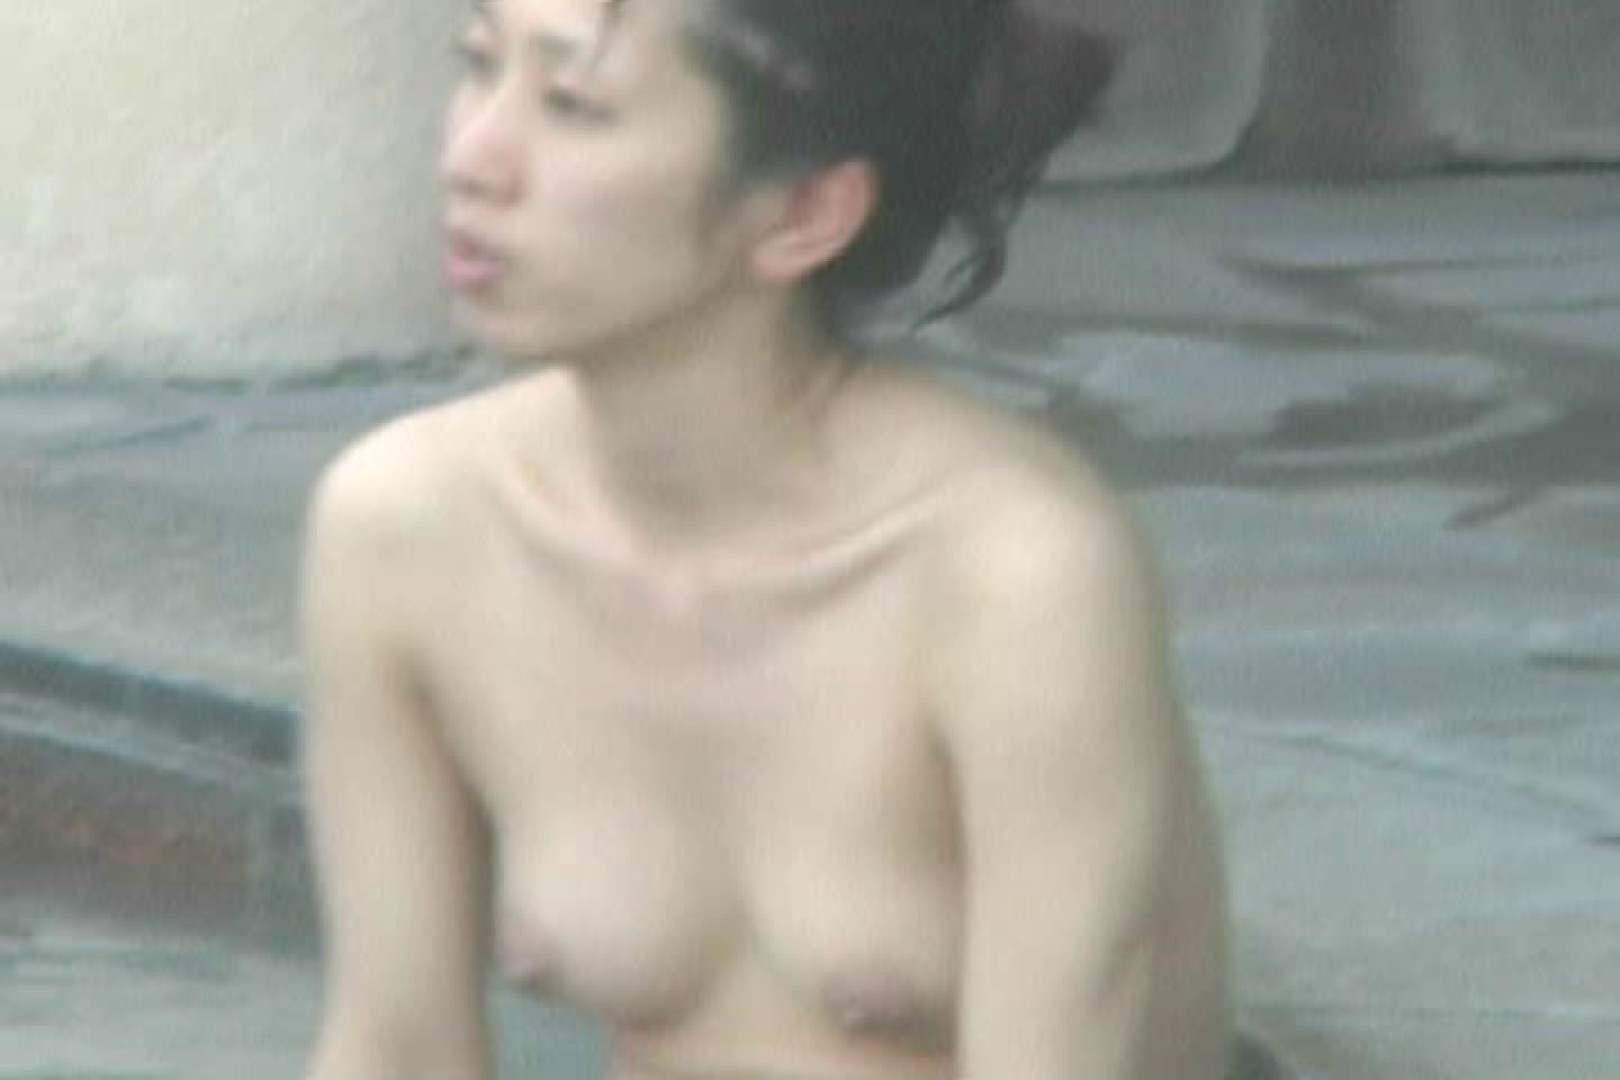 Aquaな露天風呂Vol.588 いやらしいOL 盗撮画像 41連発 22